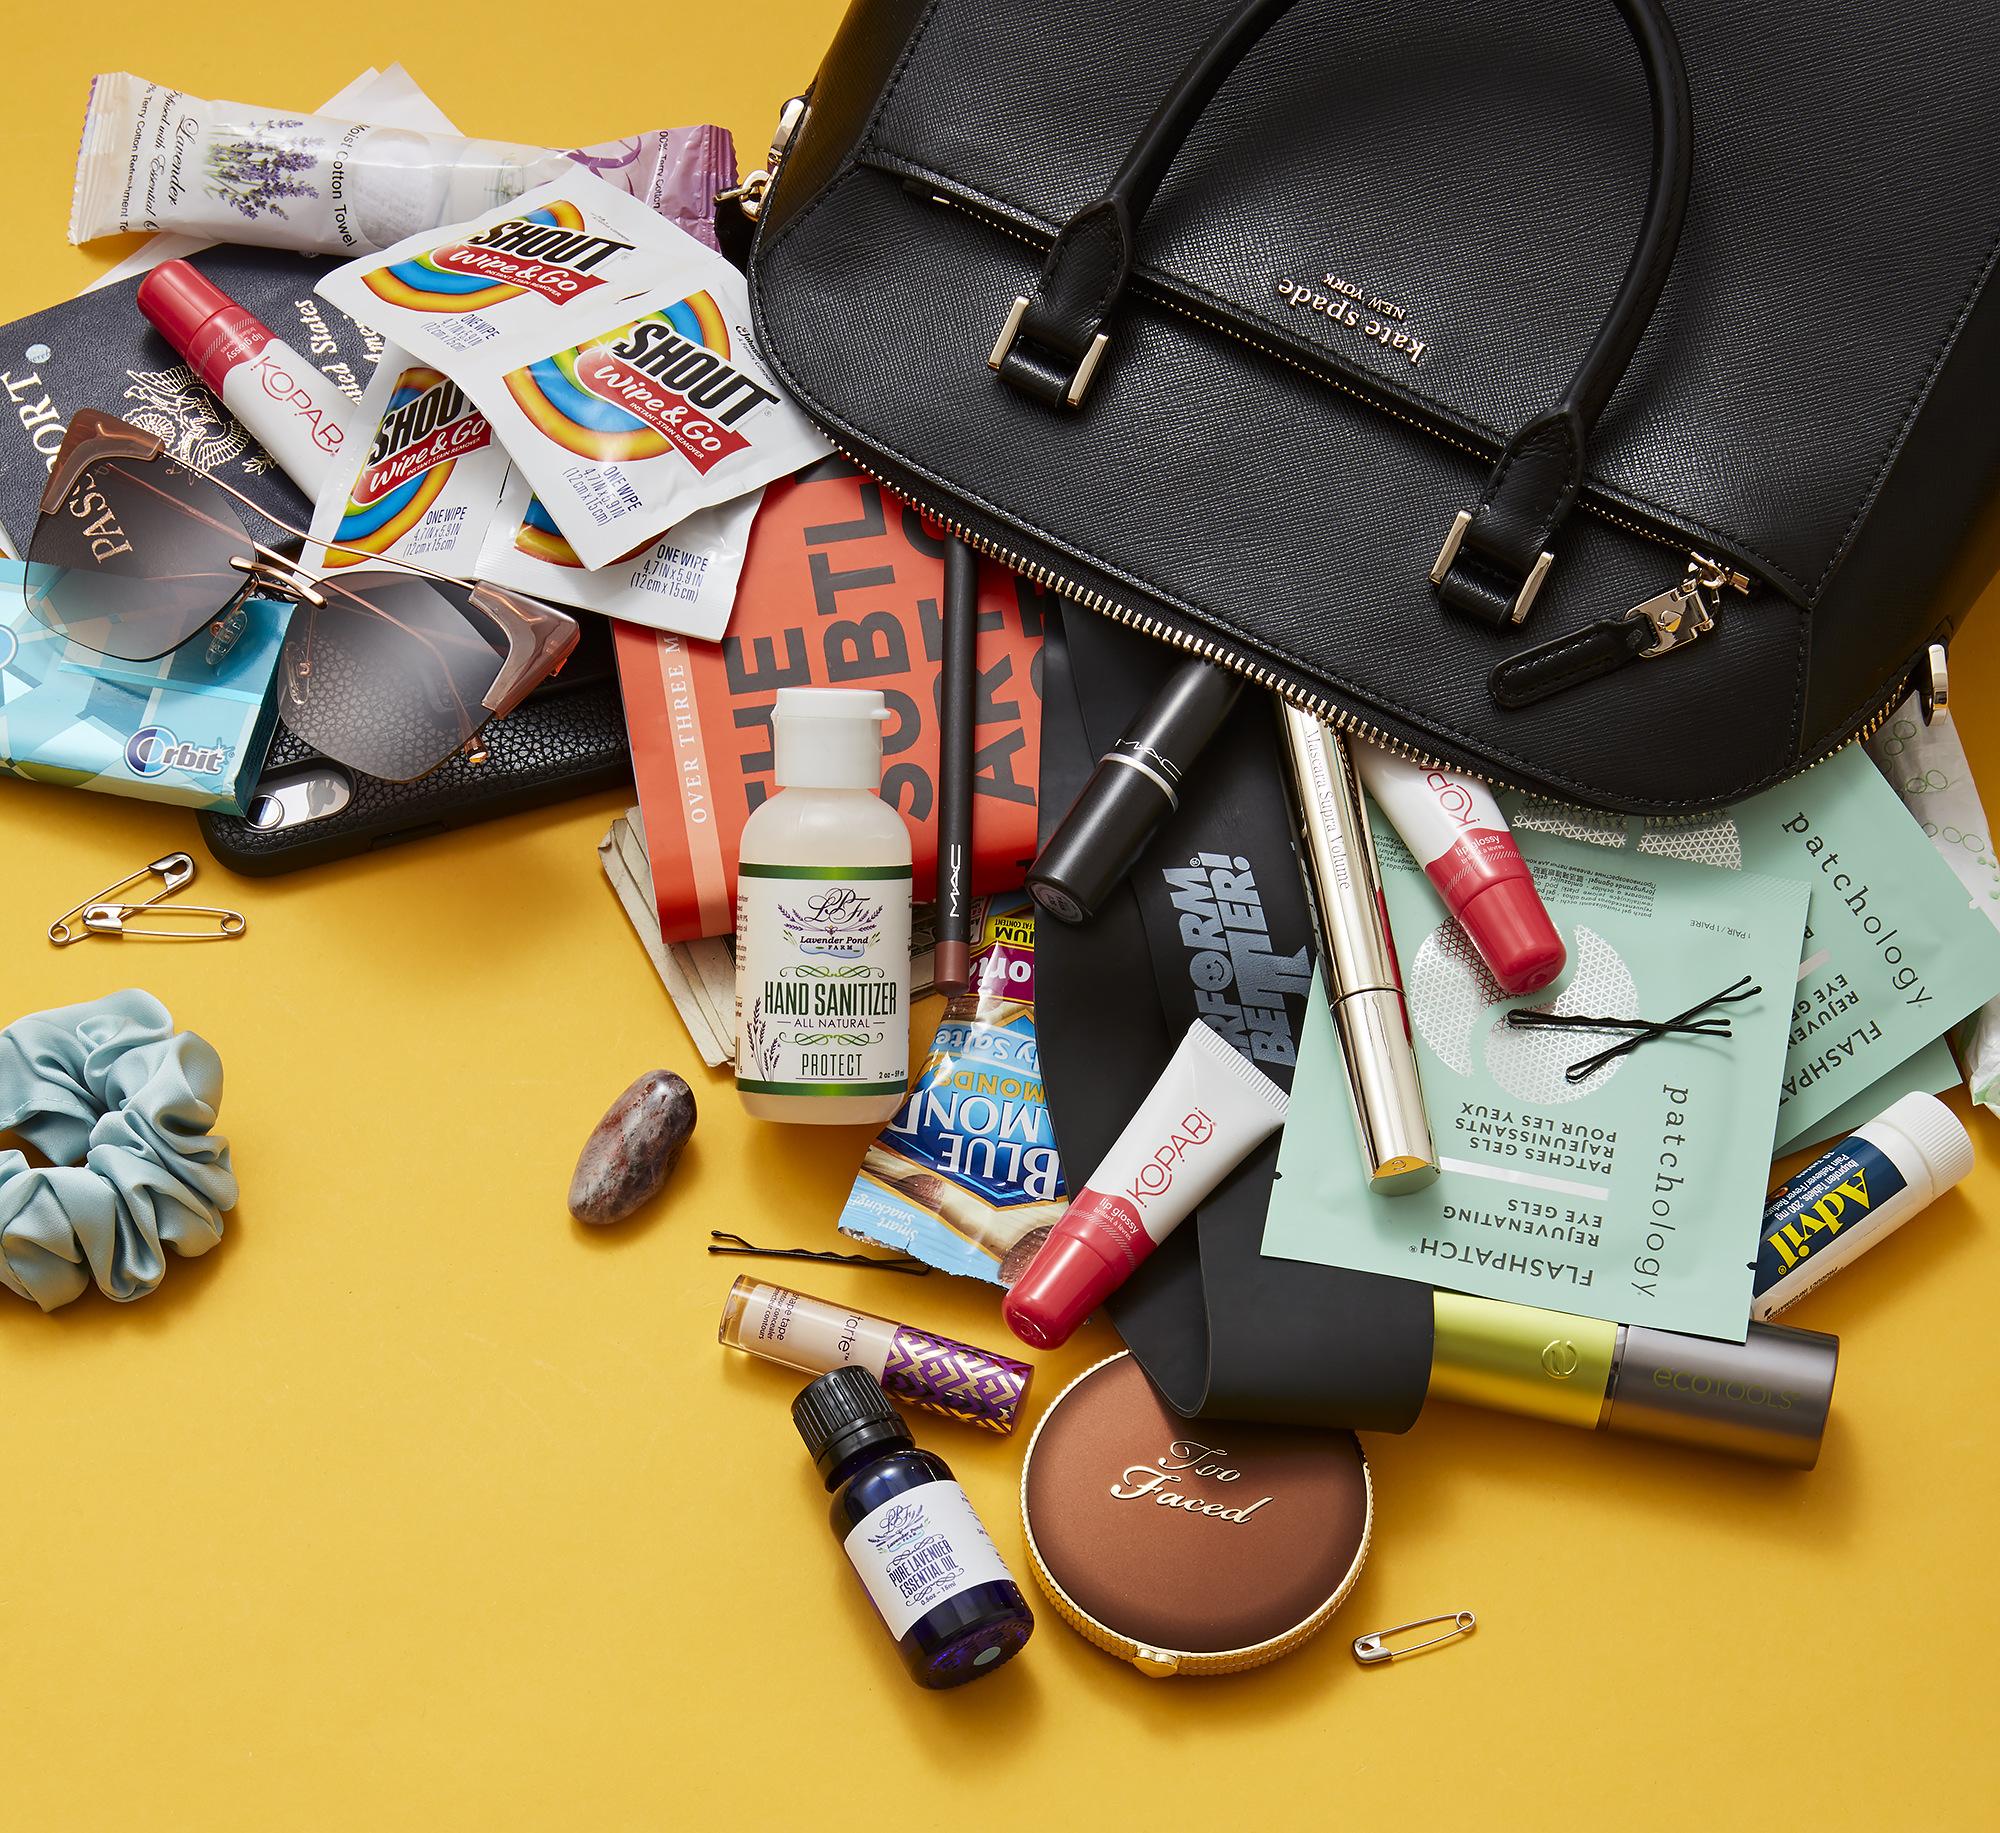 Camille Kostek bag - كميل كوستيك: ماذا يوجد في حقيبتي؟